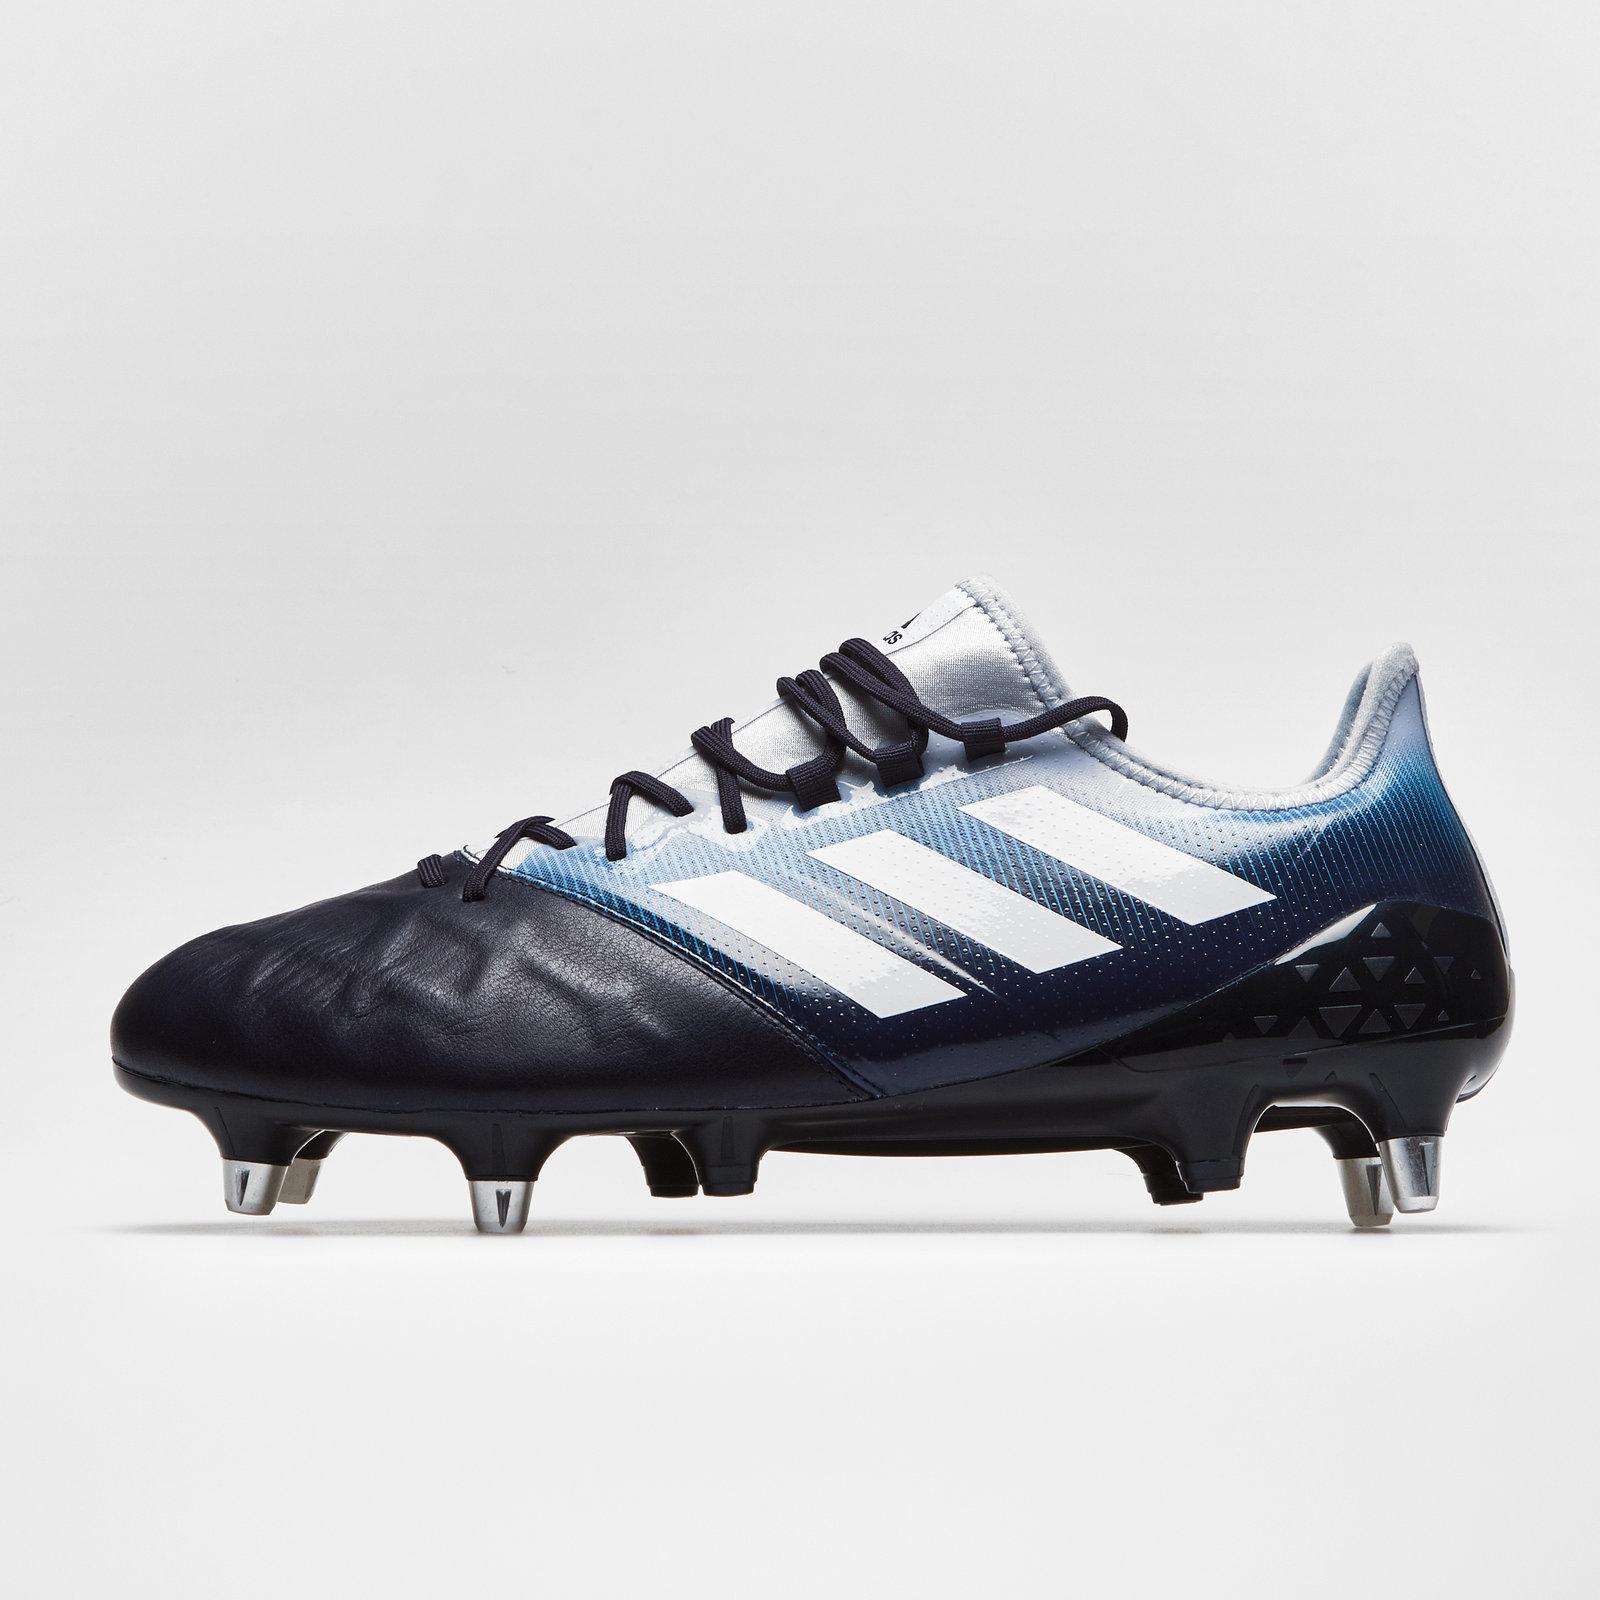 Adidas Mens Kakari Light Soft Ground Rugby Boots Sports Shoes Studs Black Ebay